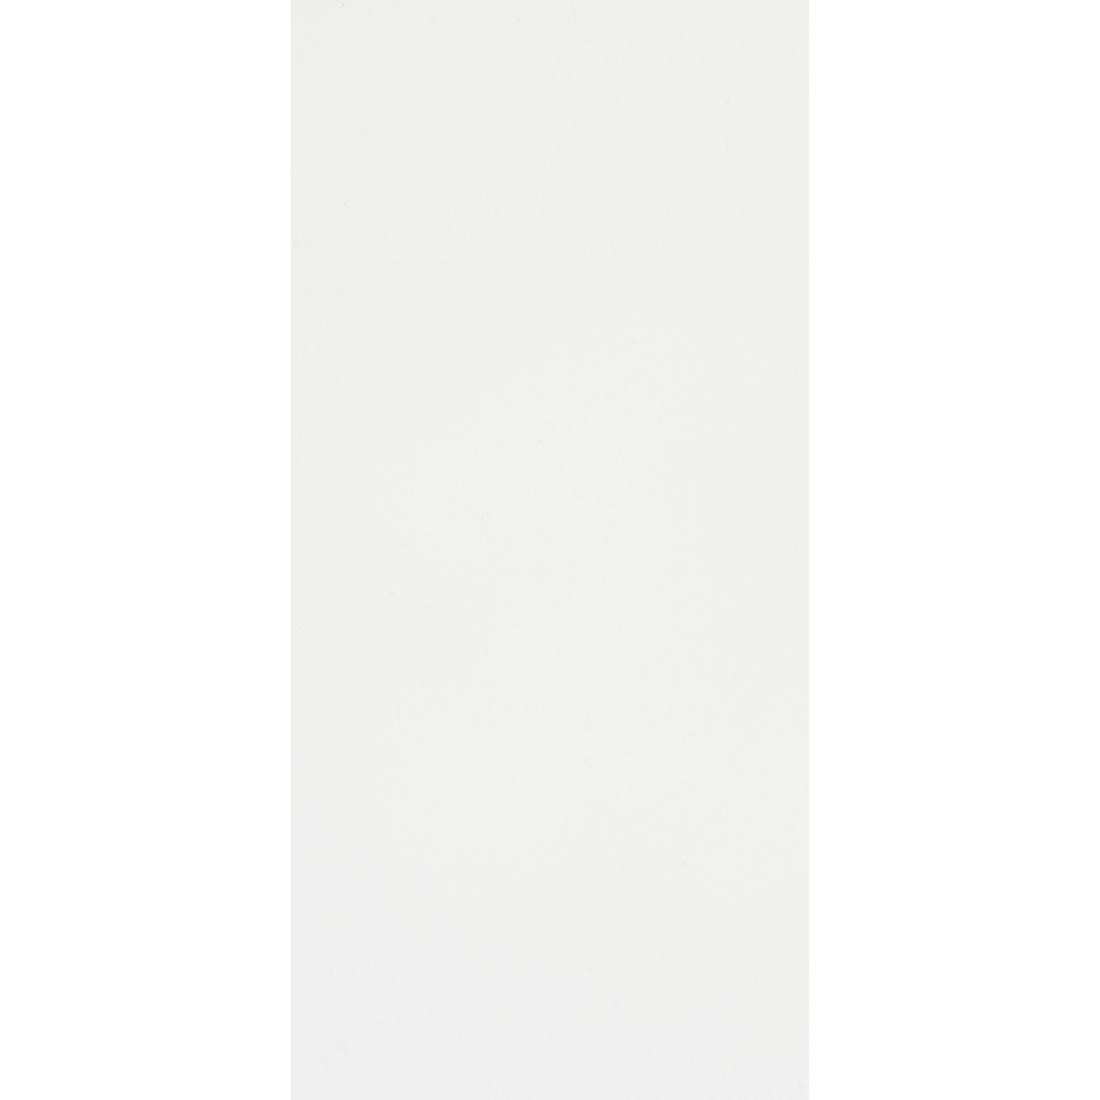 Classic Wall Lining Panel Polar Gloss 2700 x 1200 x 4.5mm